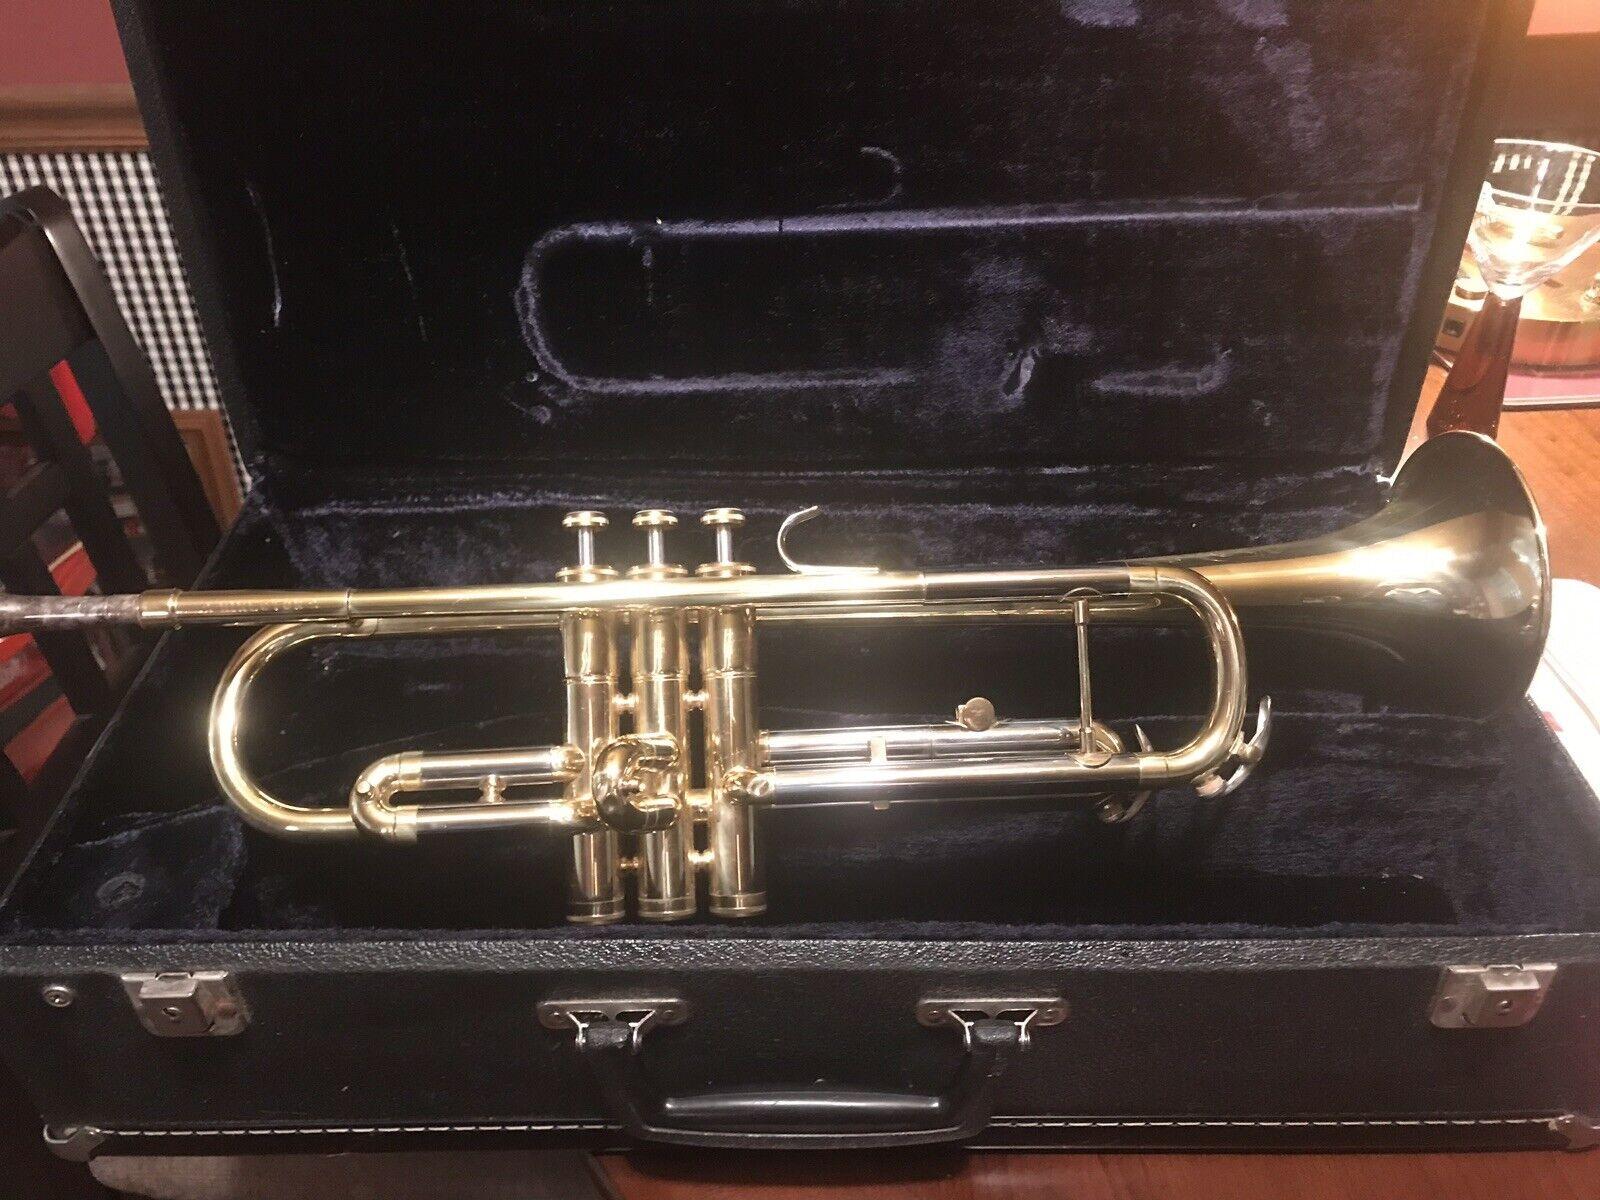 1971 Conn Director's Shooting Star Trumpet Serial P-76286 Mundstück & Case